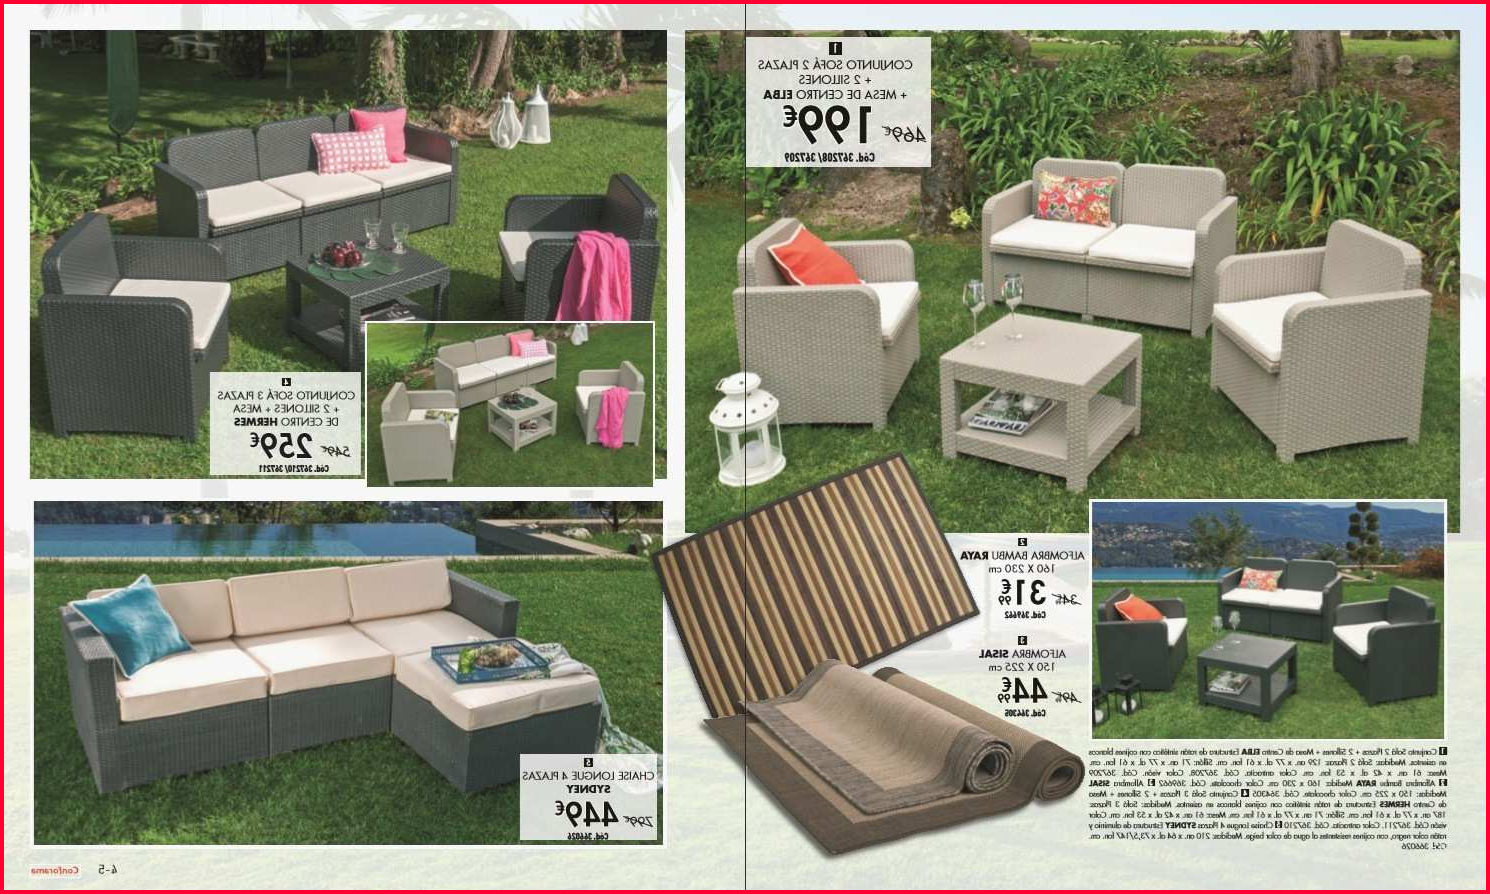 Conforama Muebles De Jardin Dwdk Conforama Muebles Jardin Adorable Tumbonas Conforama Catalogo